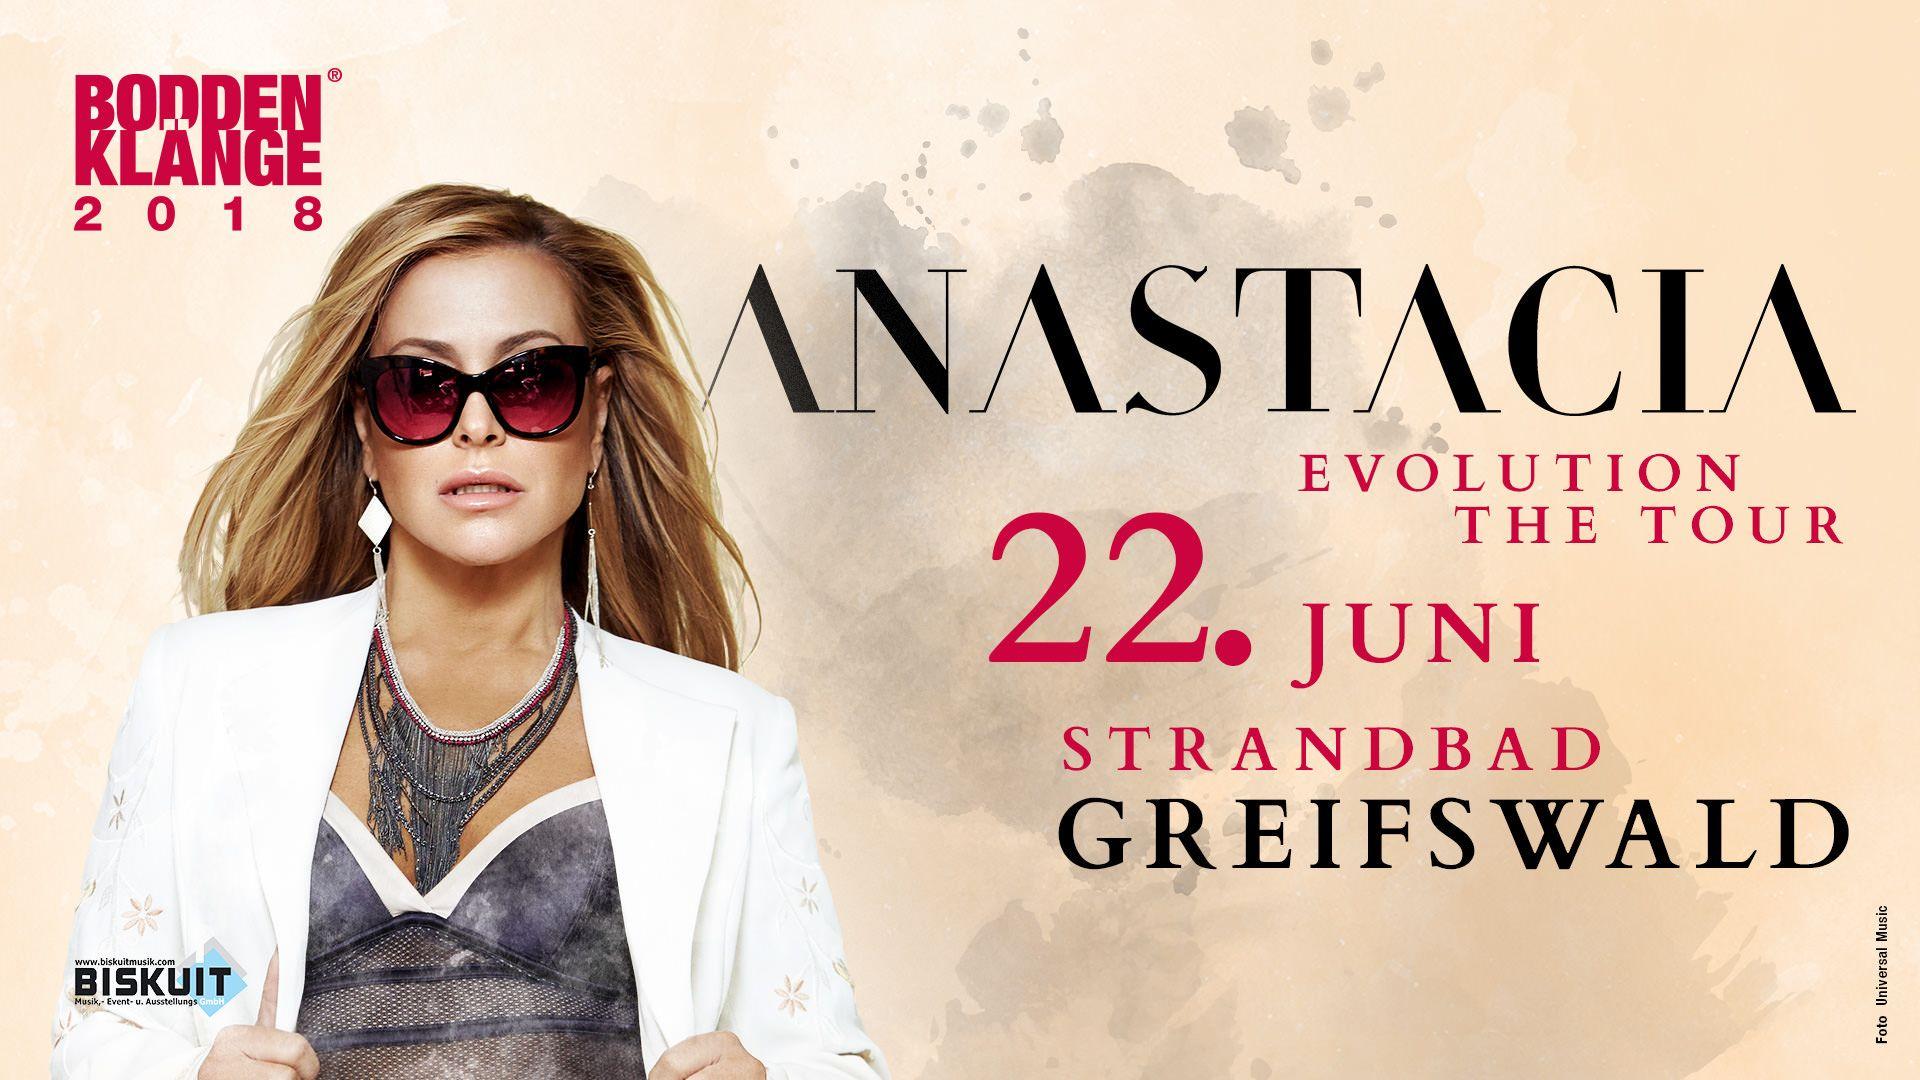 Anastacia Greifswald